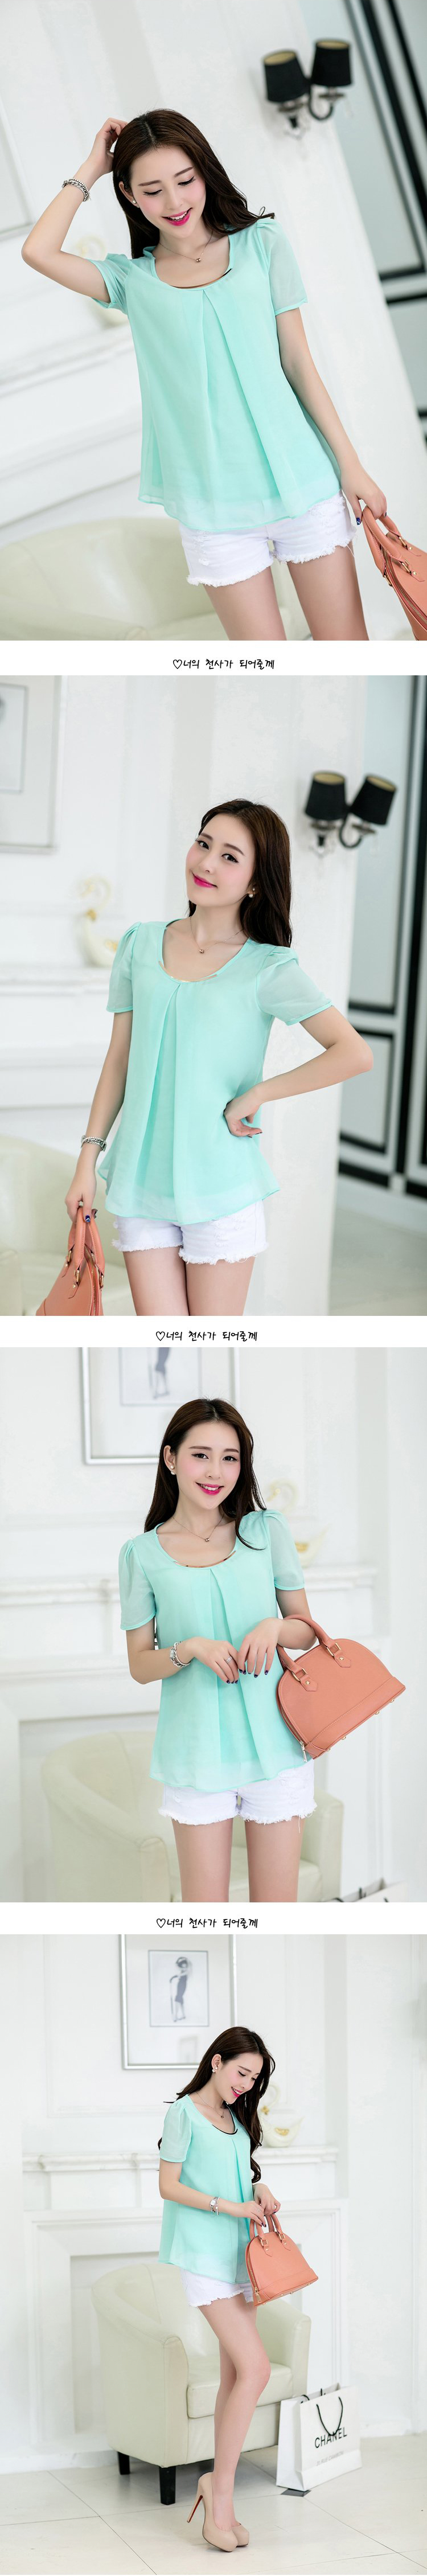 HTB14E79PVXXXXc5apXXq6xXFXXXw - Women's Chiffon Blouse Shirt 2017 Short Sleeve Plus Size 3XL